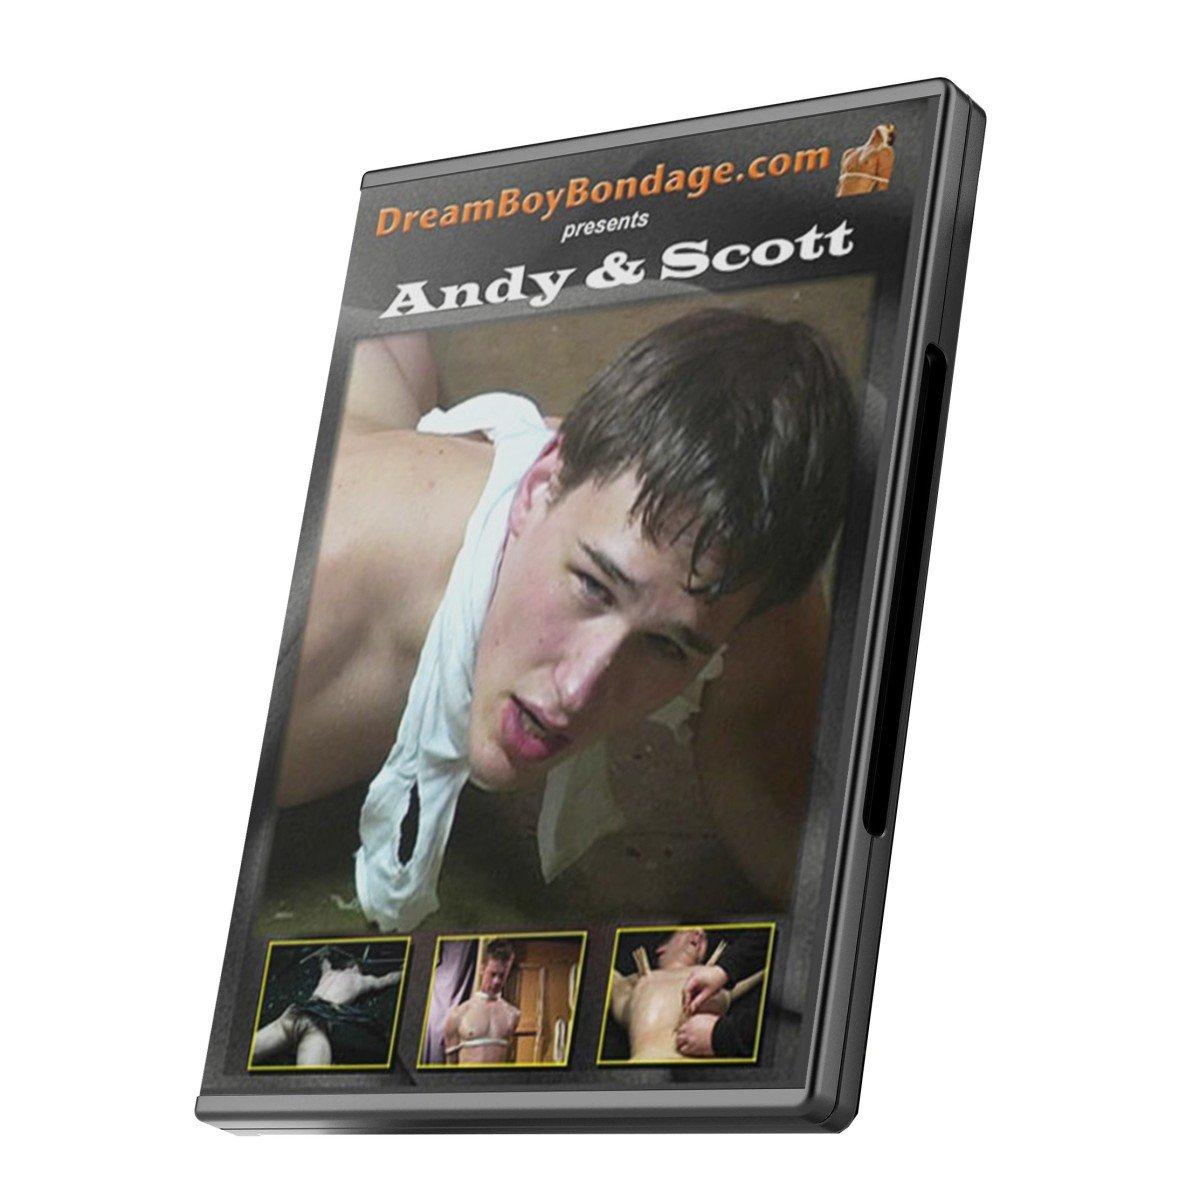 DreamBoyBondage.com: Andy & Scott DVD